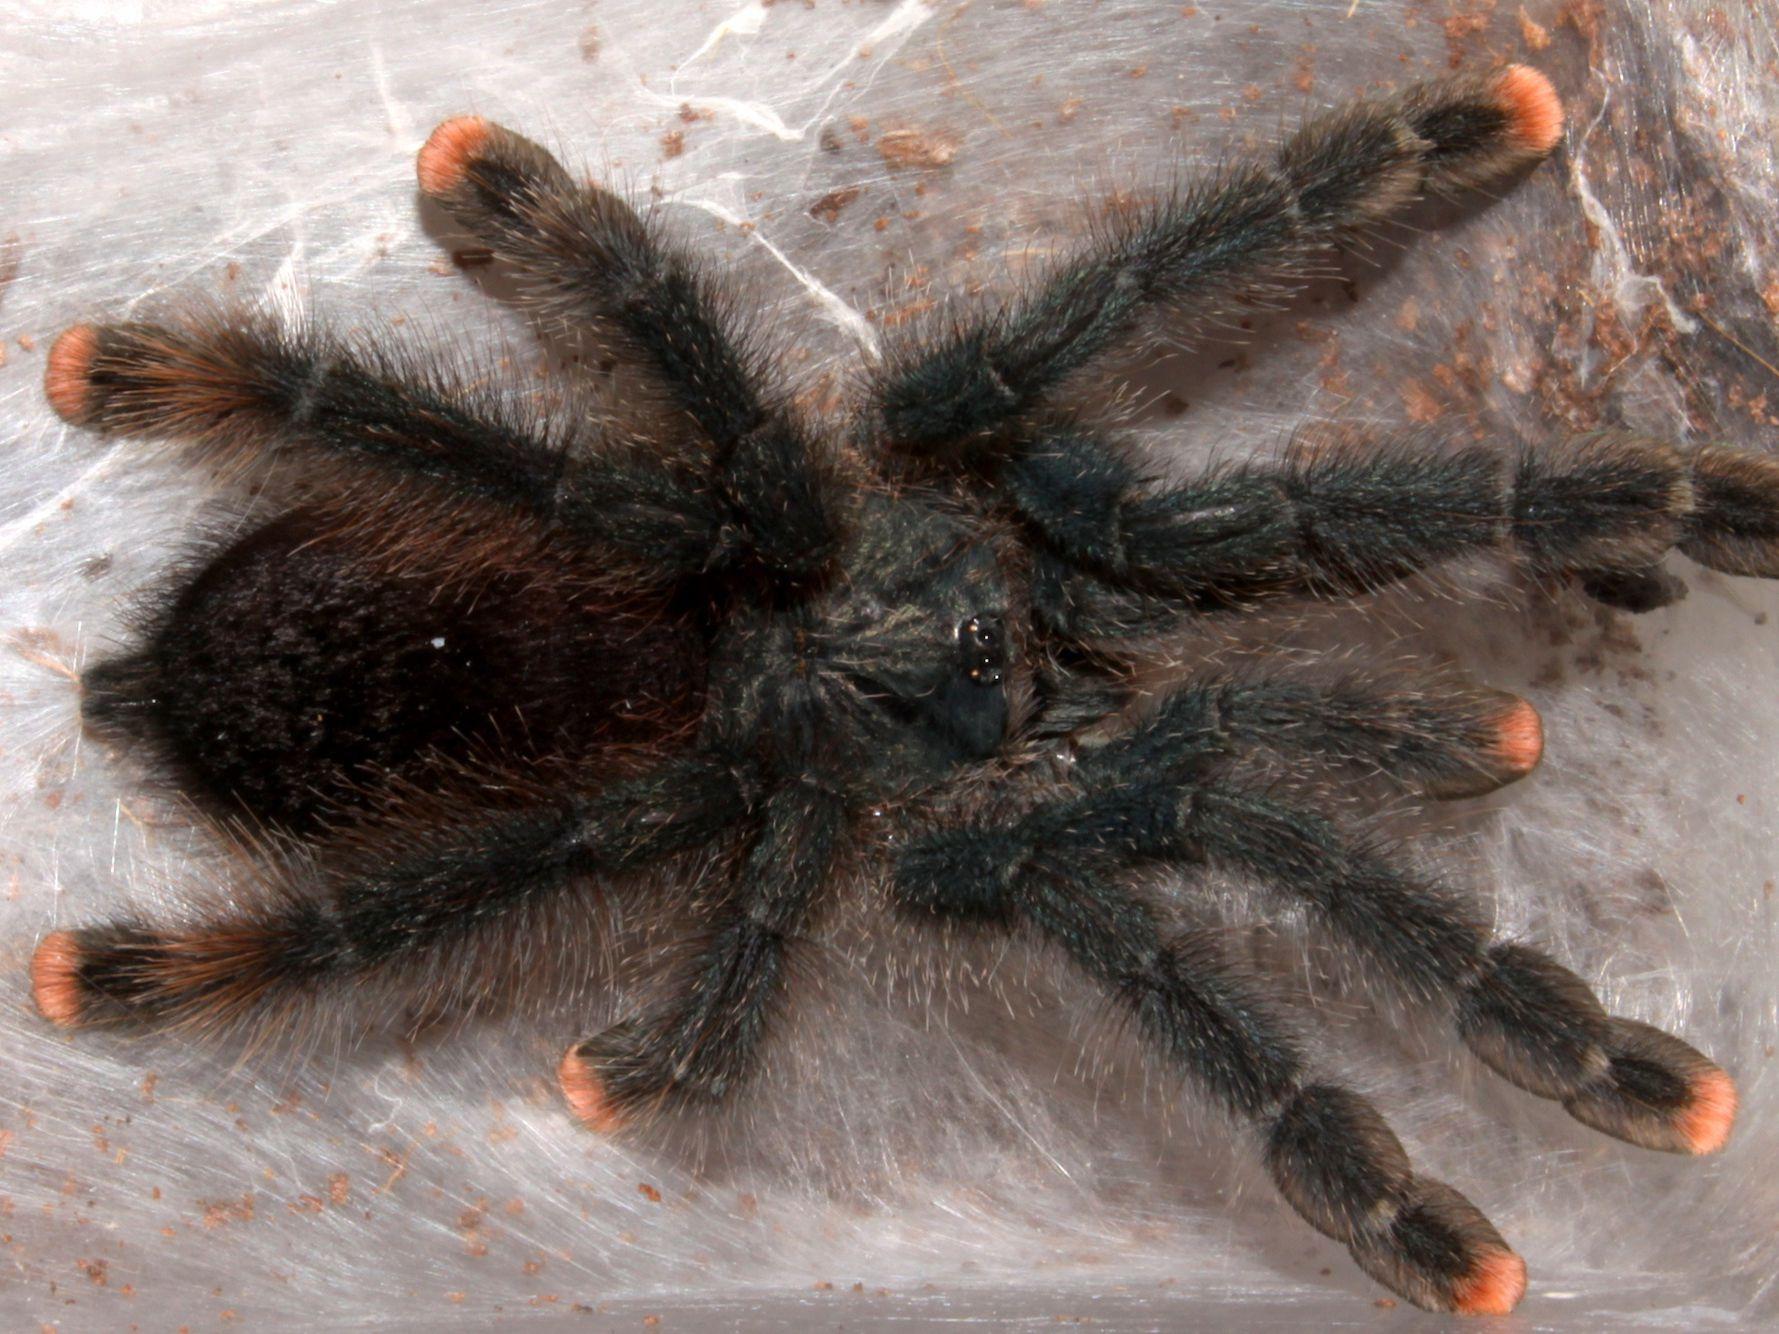 Keeping And Caring For Pink Toe Tarantulas As Pets